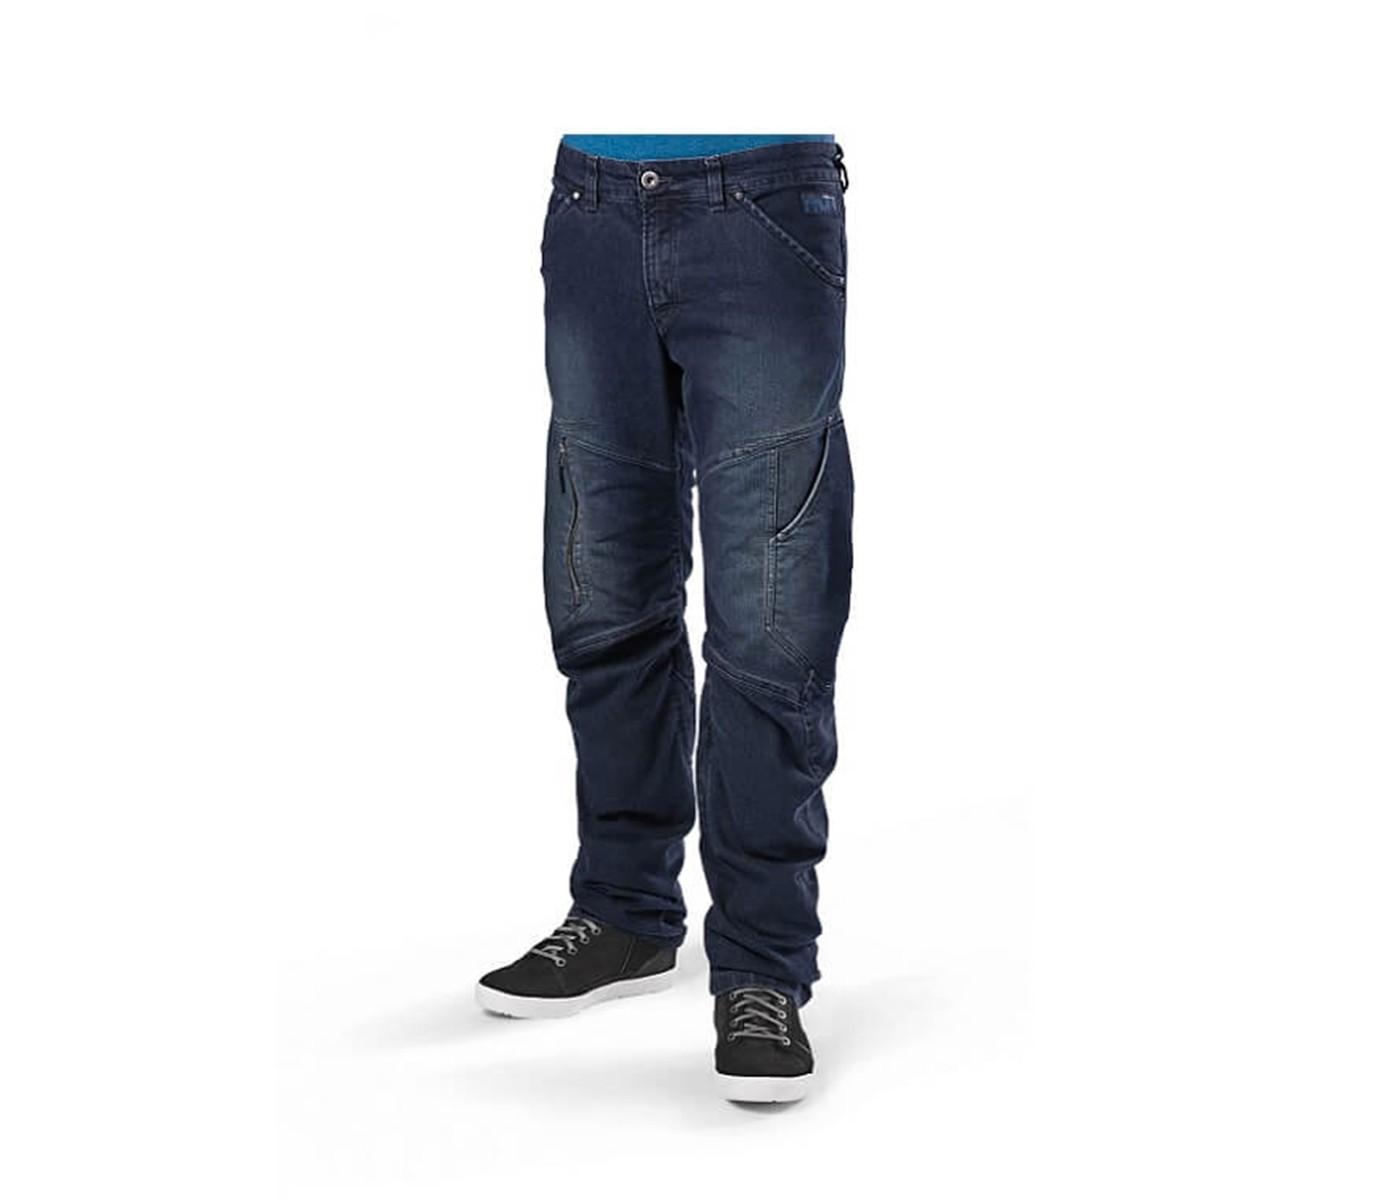 51eb4f2195f4 -8% BMW Motorrad Παντελόνι City Denim Trousers Men ΕΝΔΥΣΗ